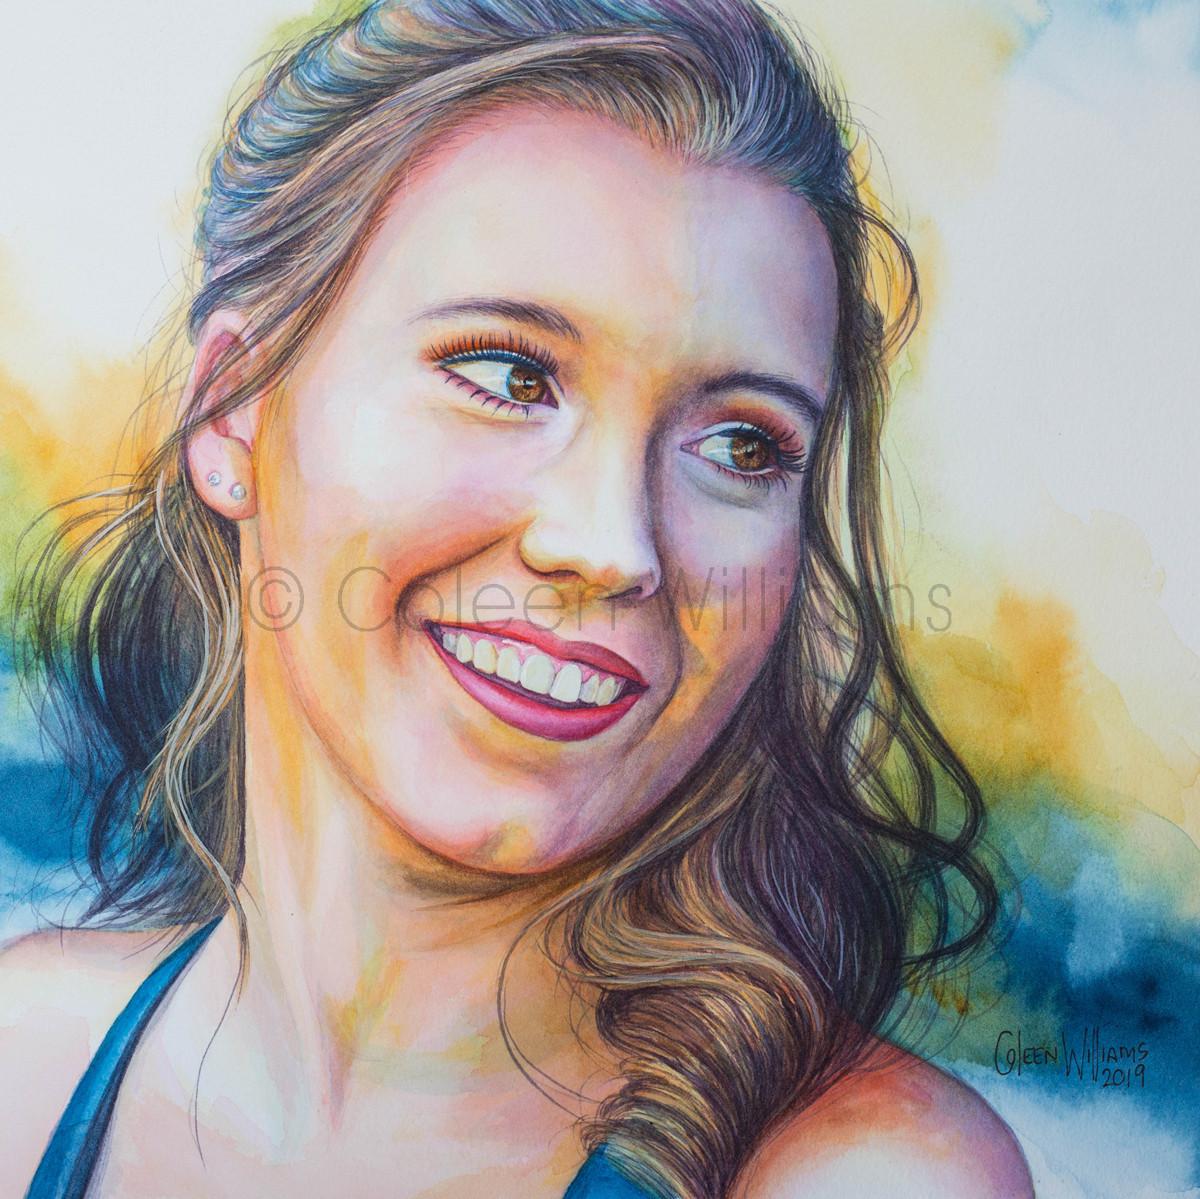 ColArt - Art by Coleen Williams - Tyler - Portrait